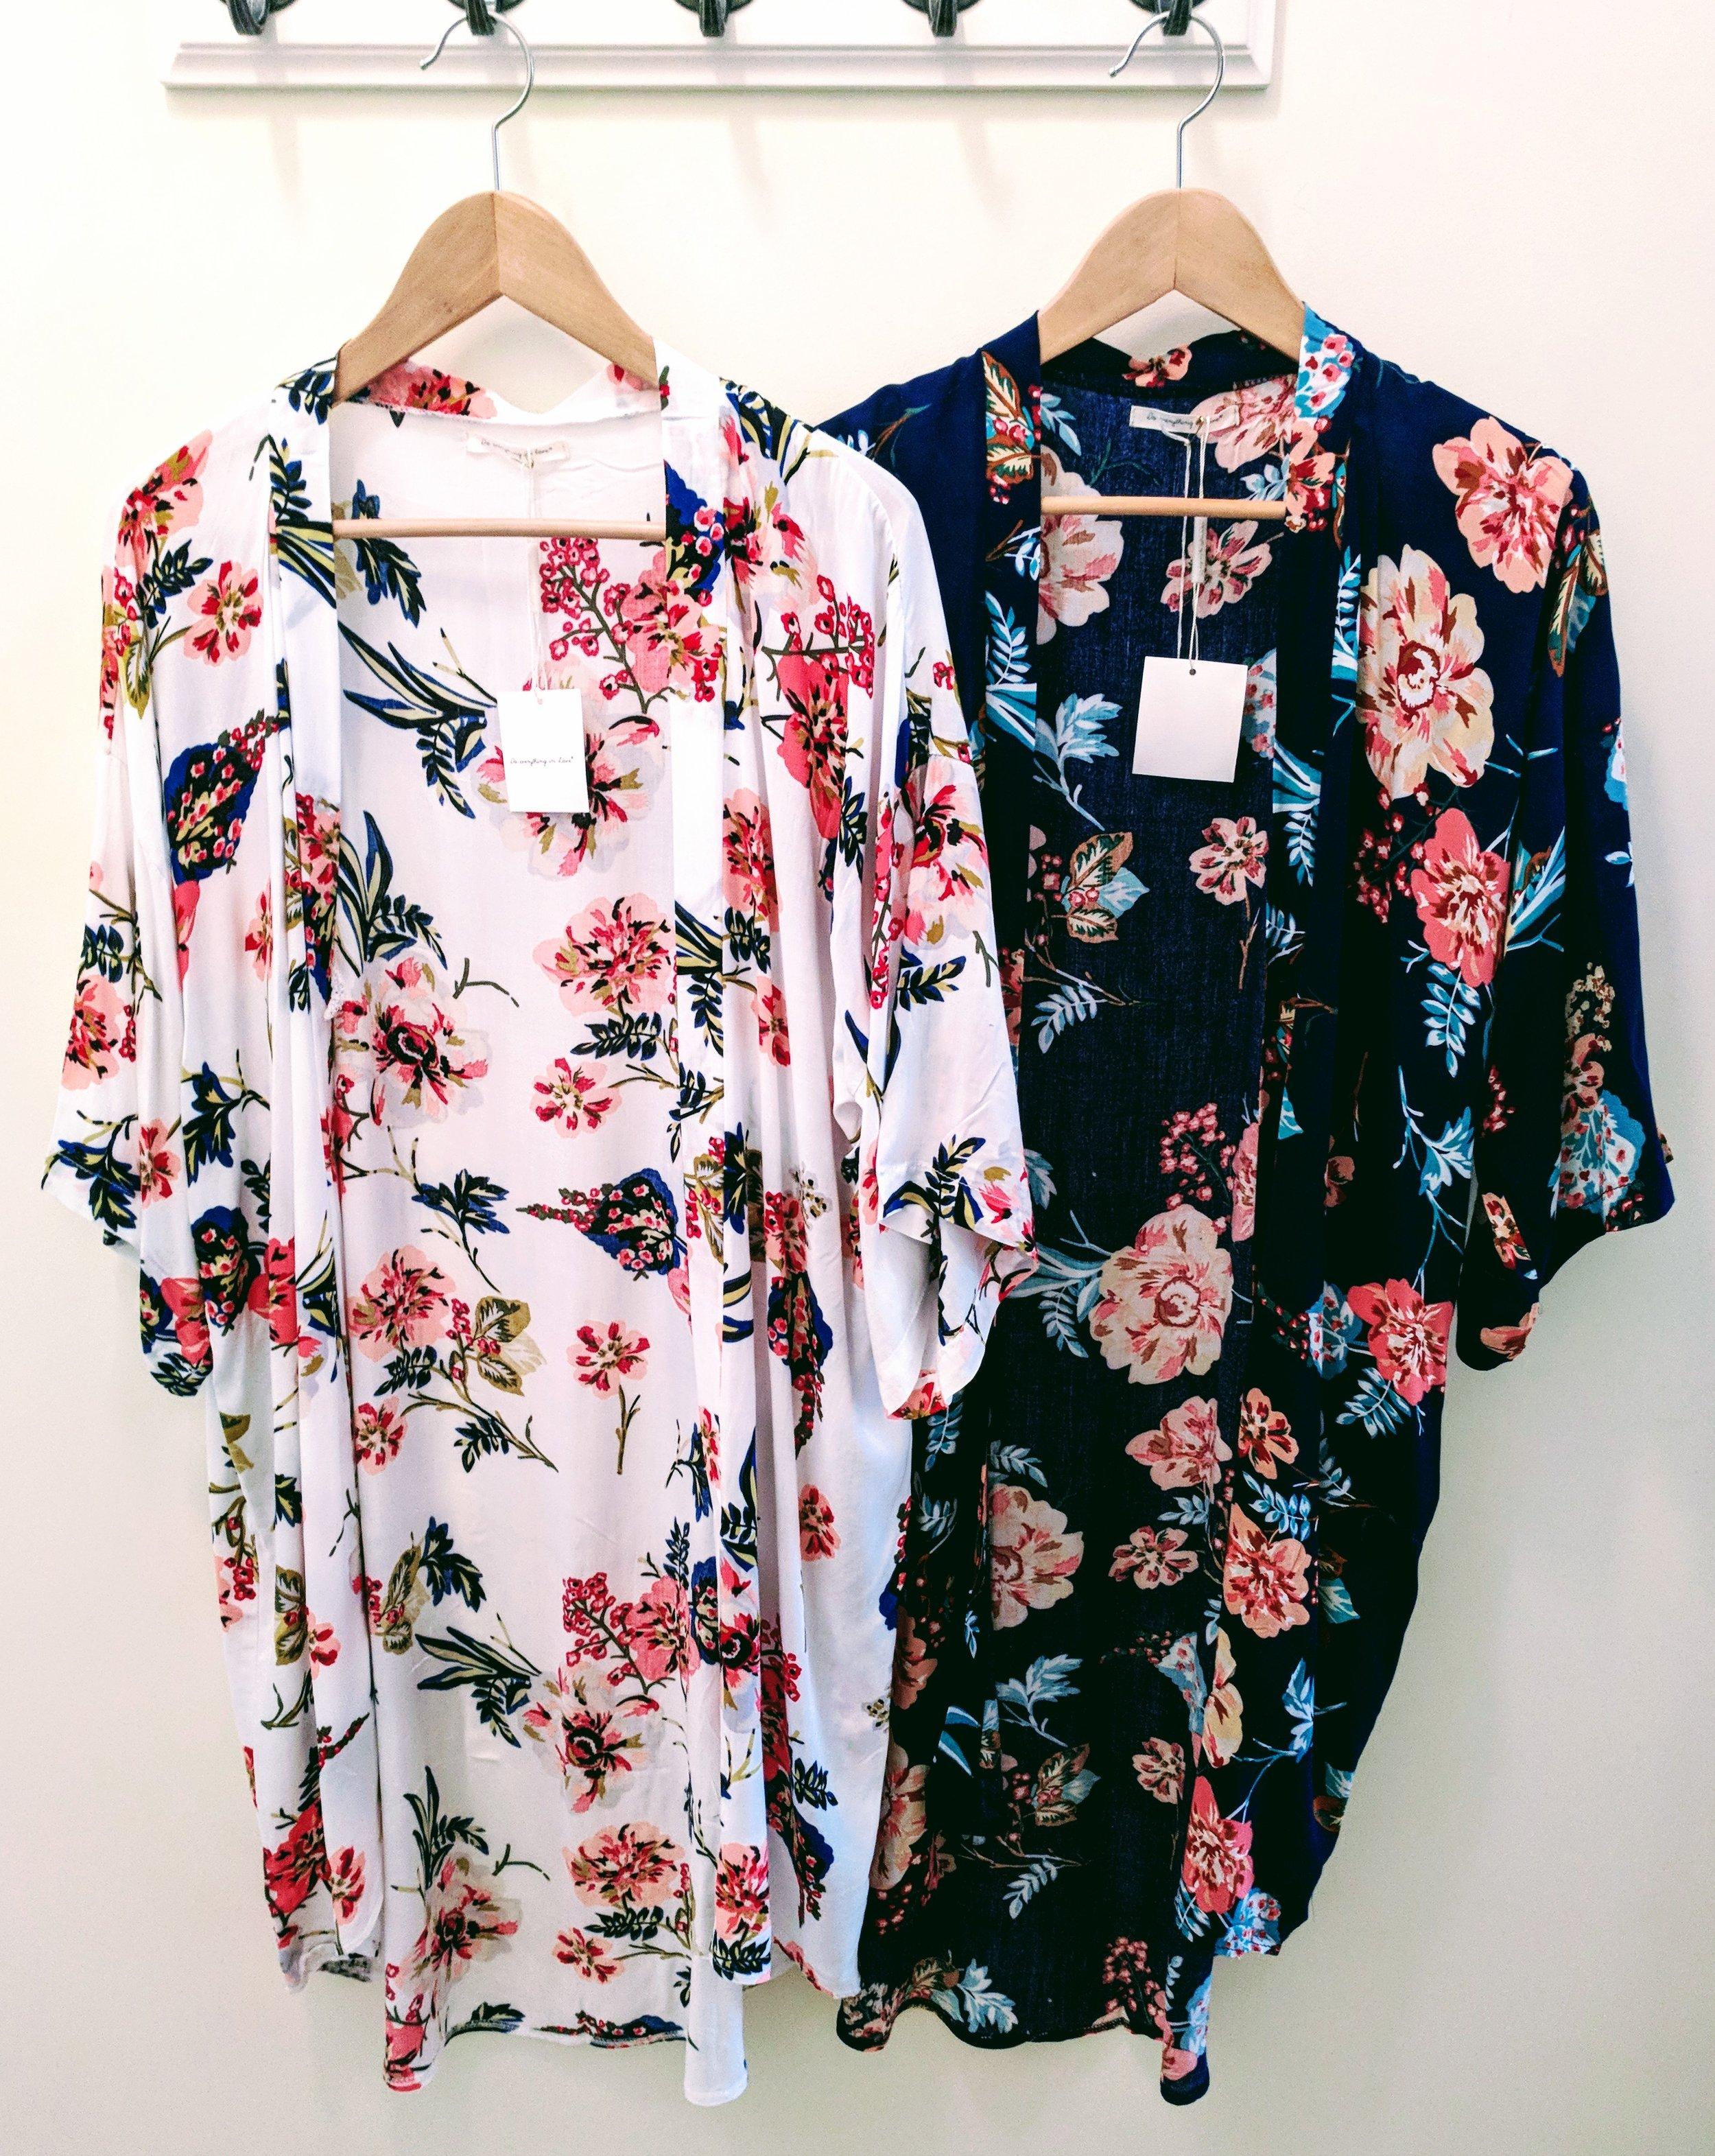 White and Navy floral print long kimono.